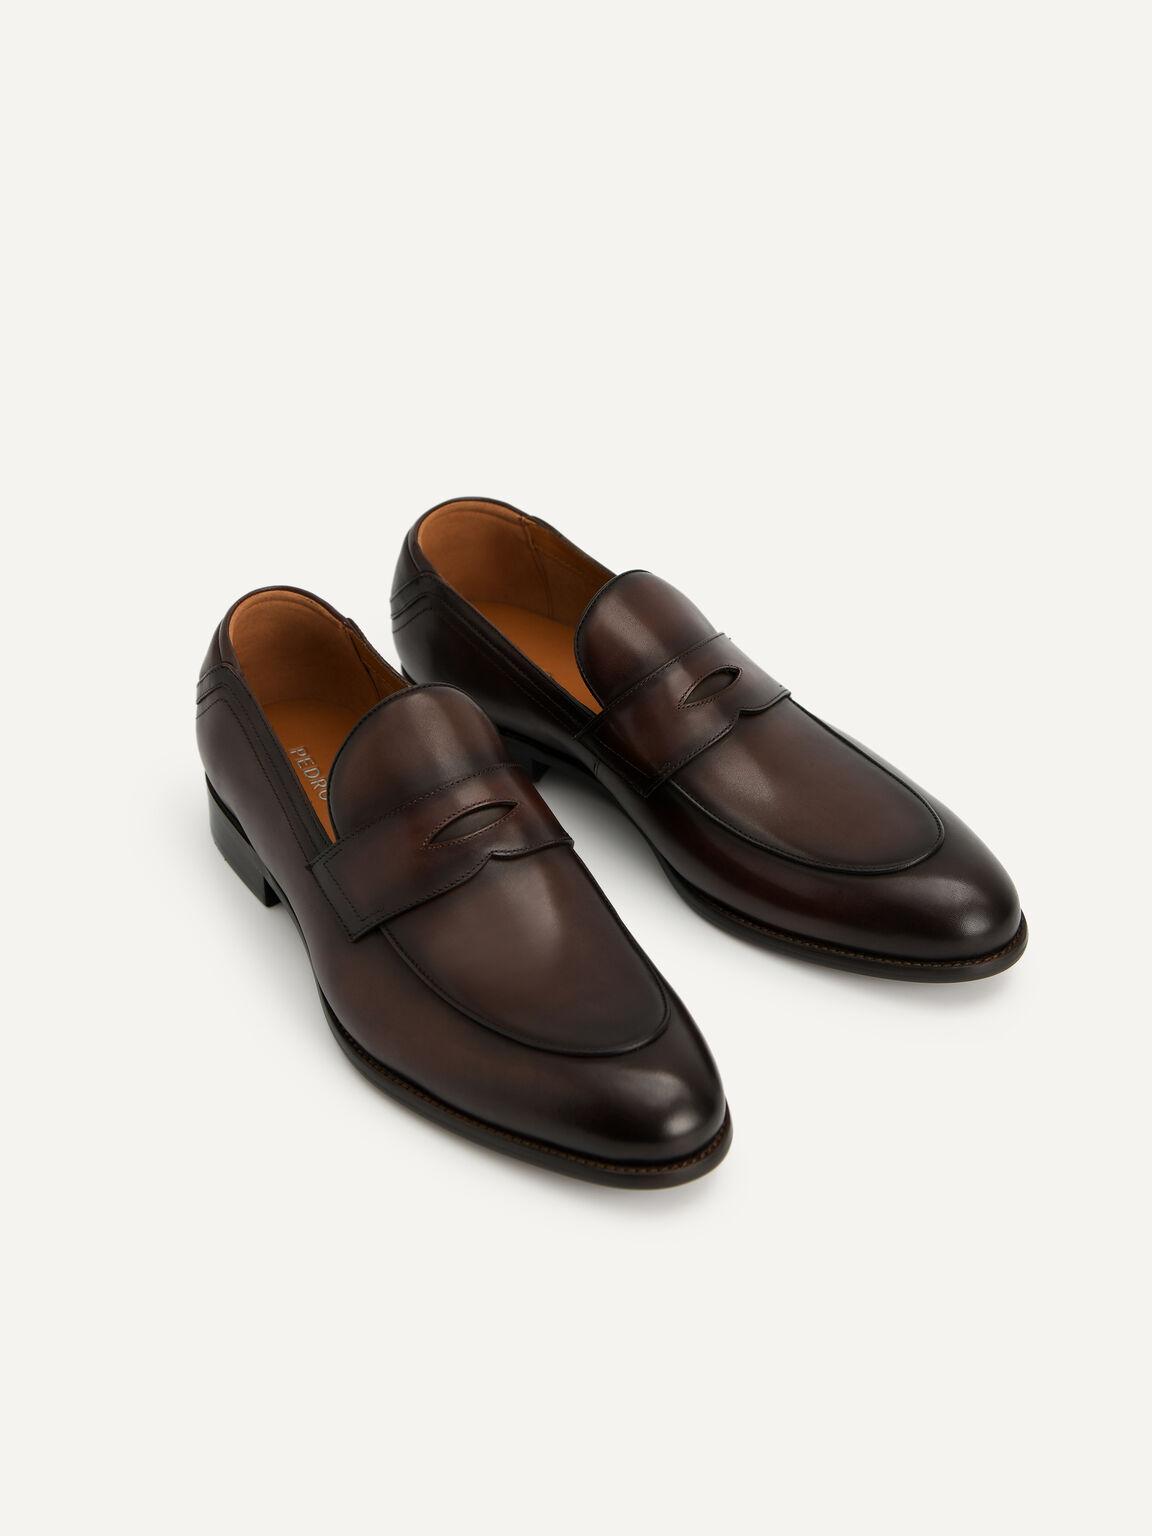 皮革便士樂福鞋, 棕色, hi-res